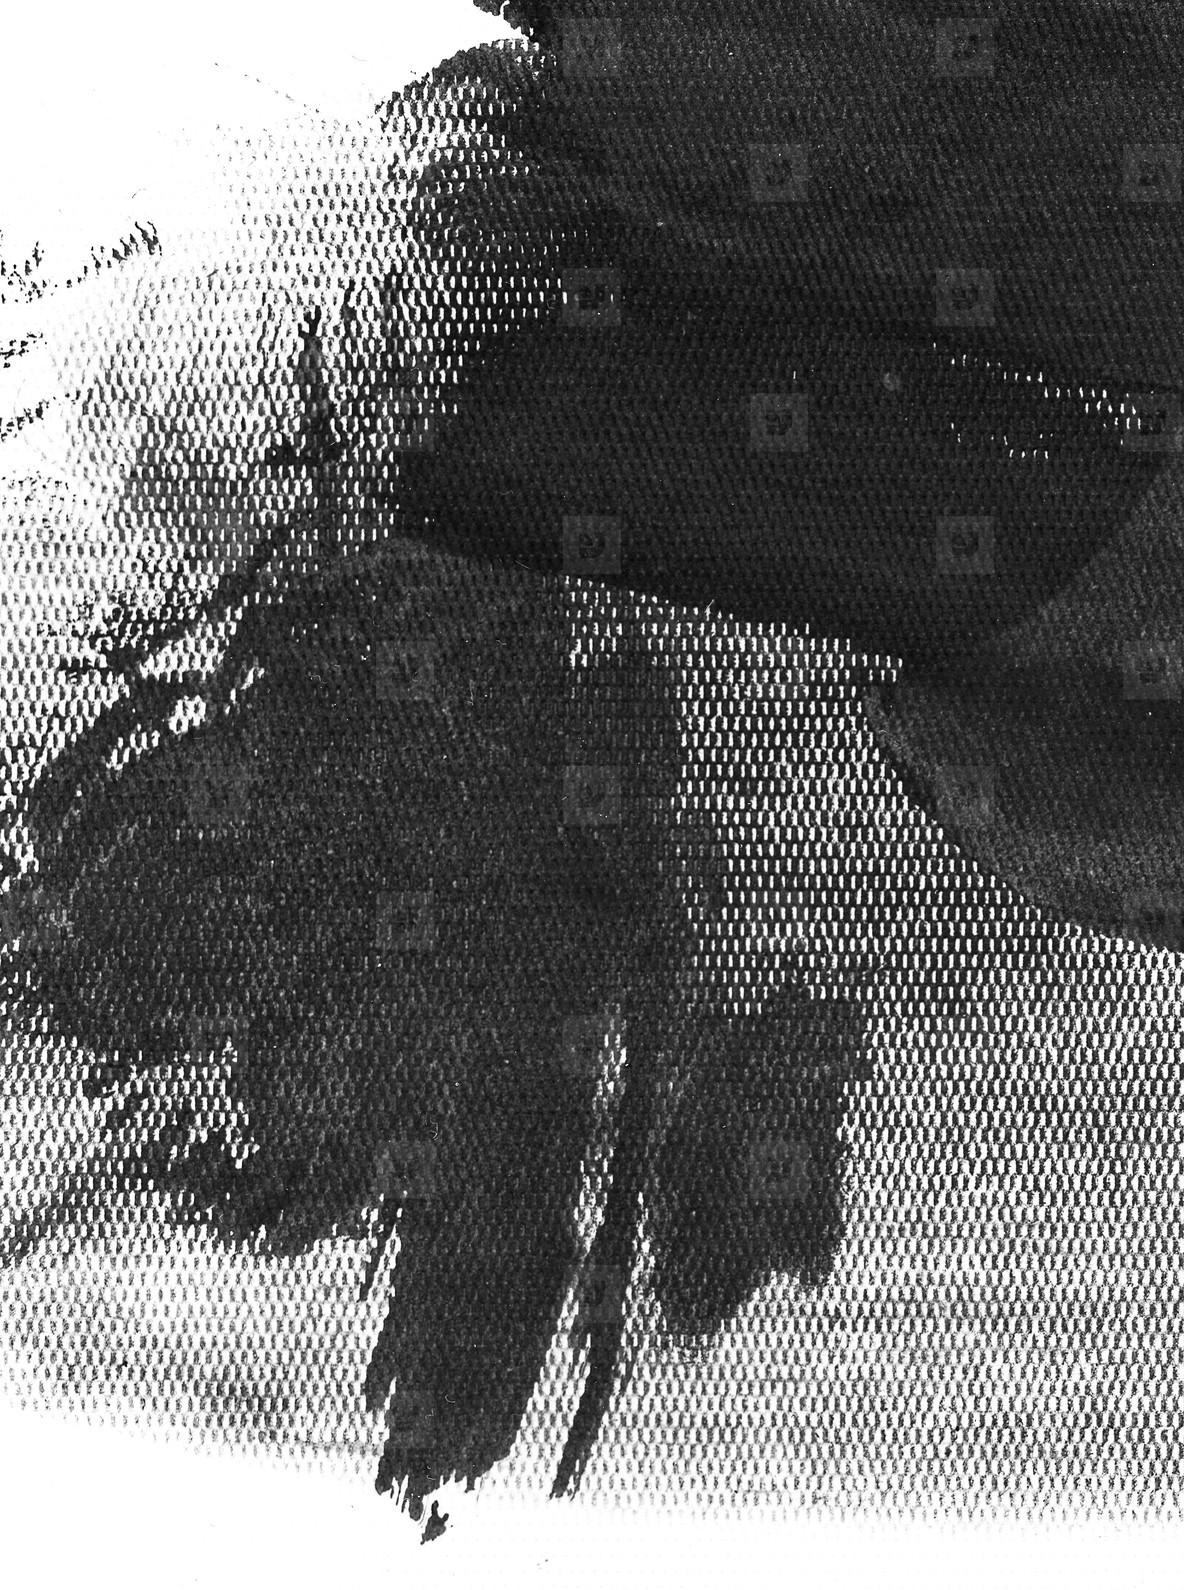 Ink Texture I